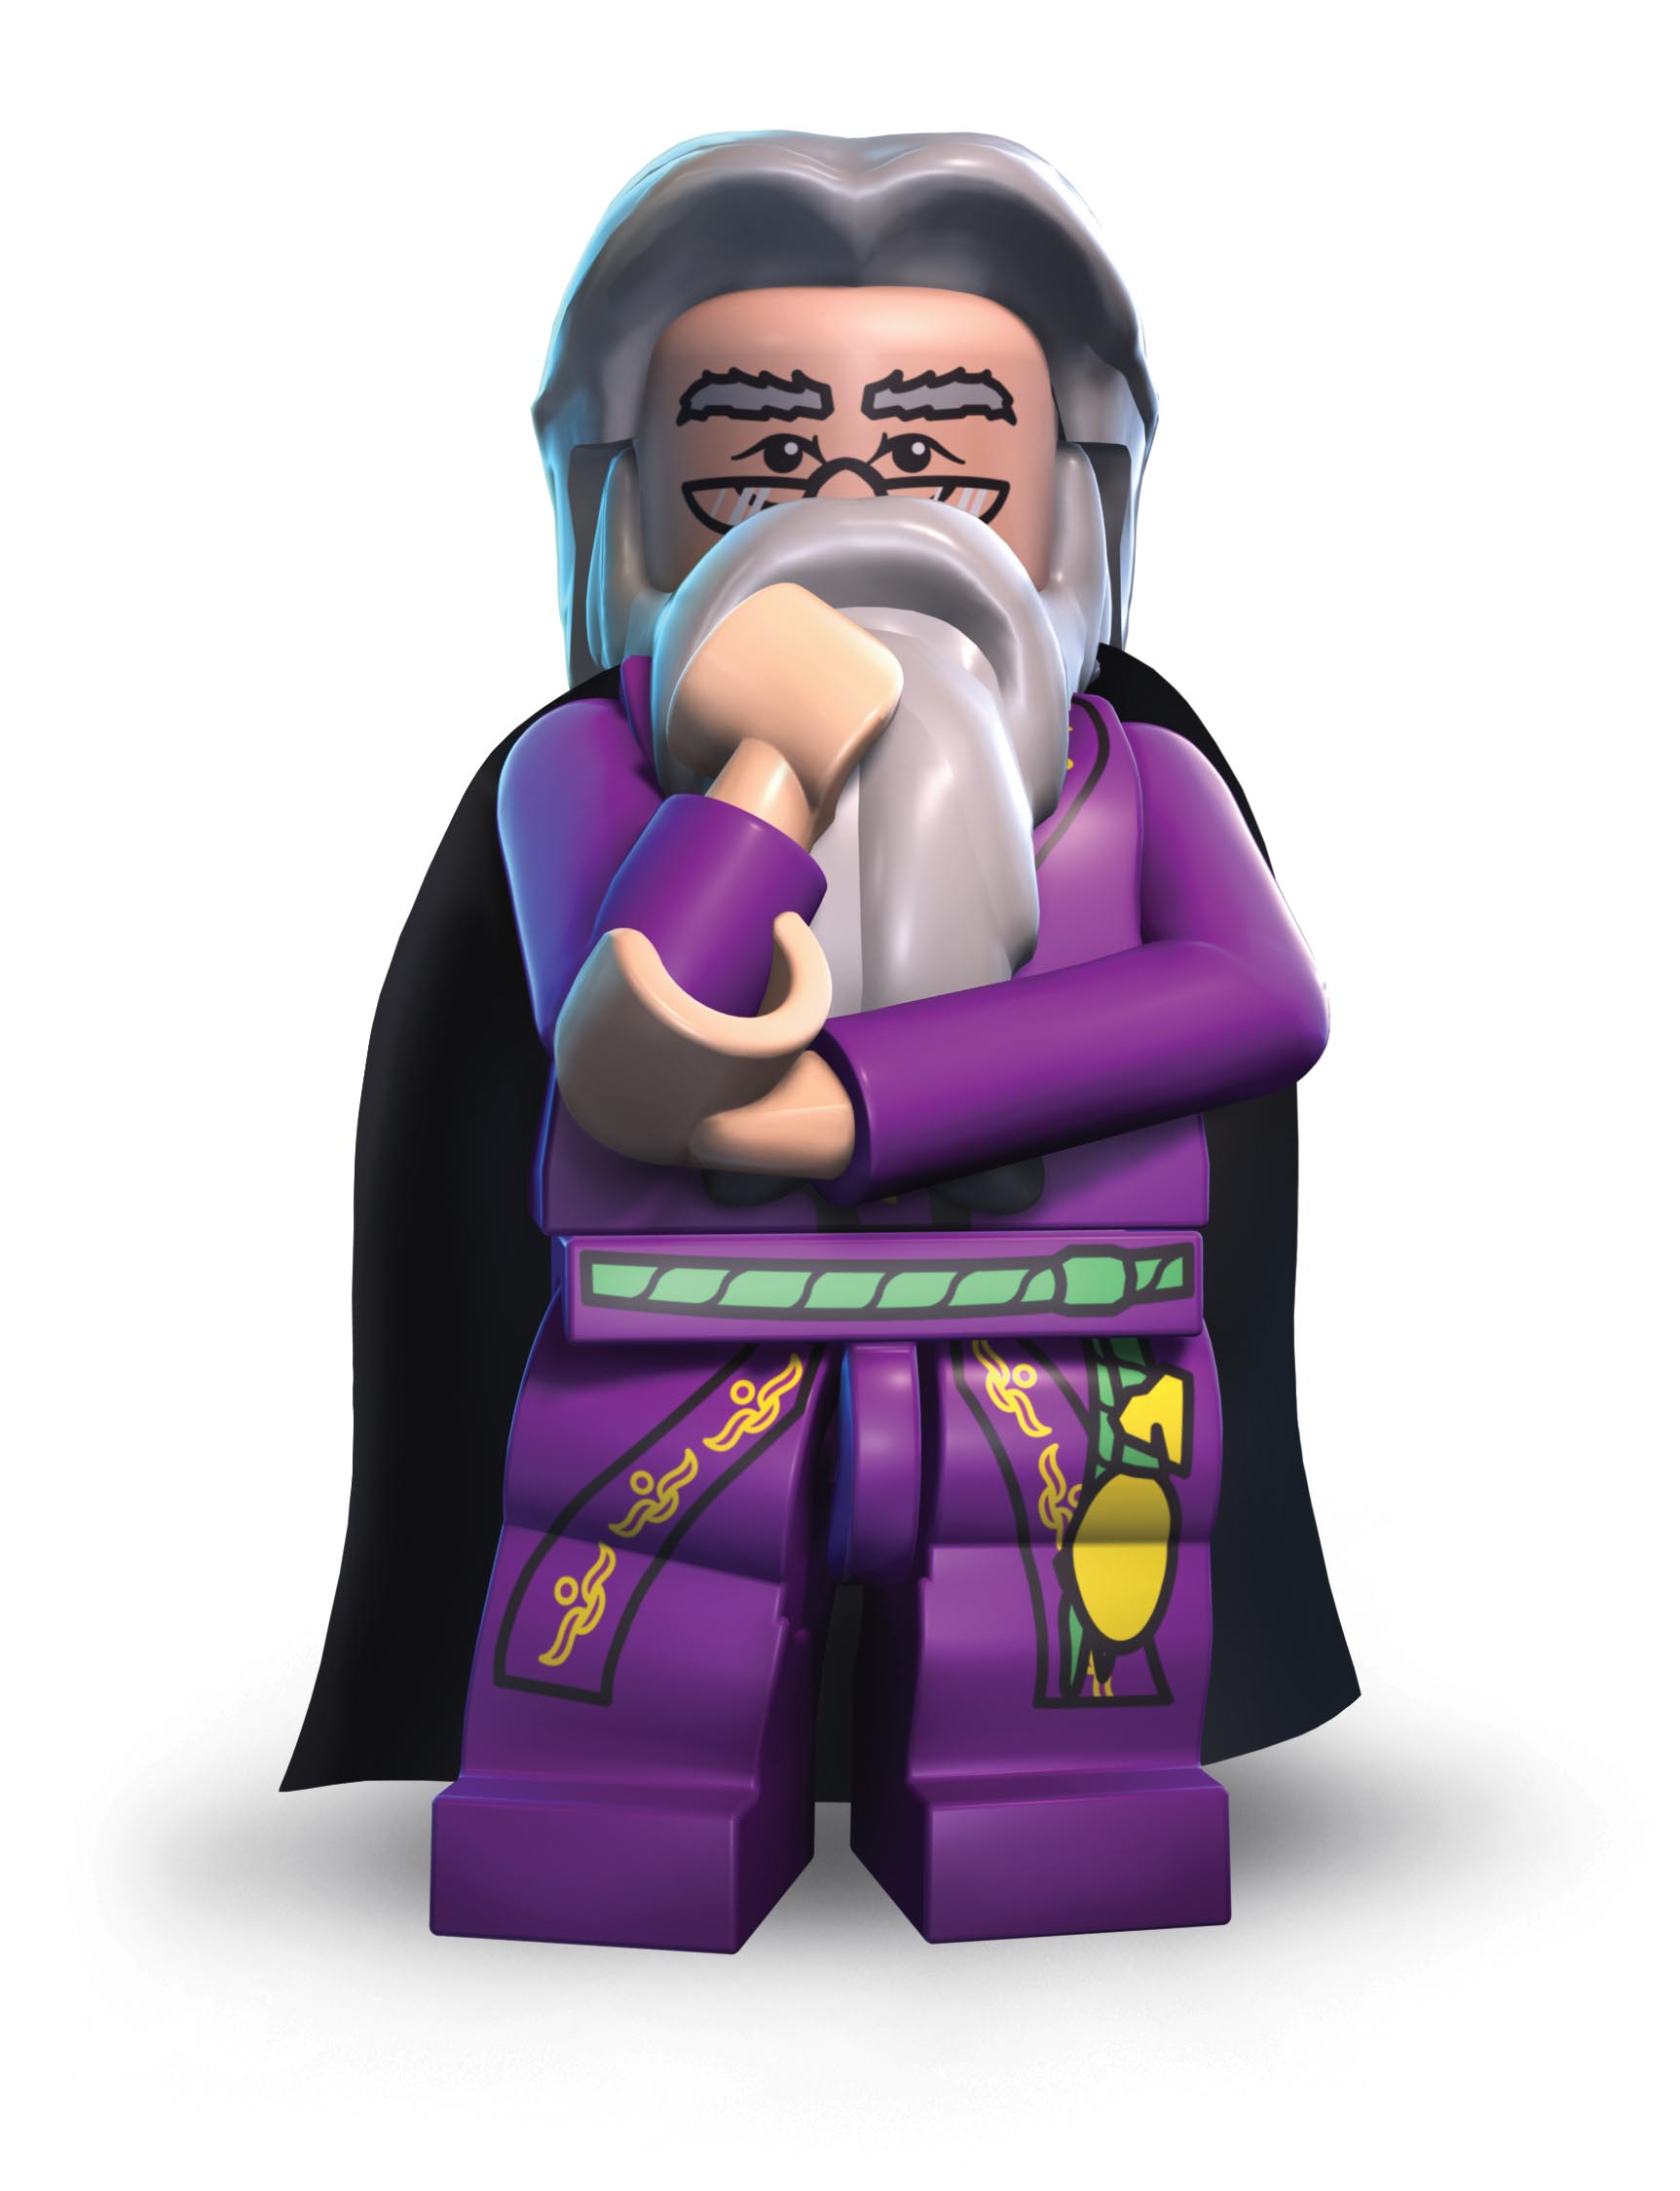 http://images.wikia.com/harrypotter/images/c/cb/Lego2_02_Albus_Dumbledore.jpg